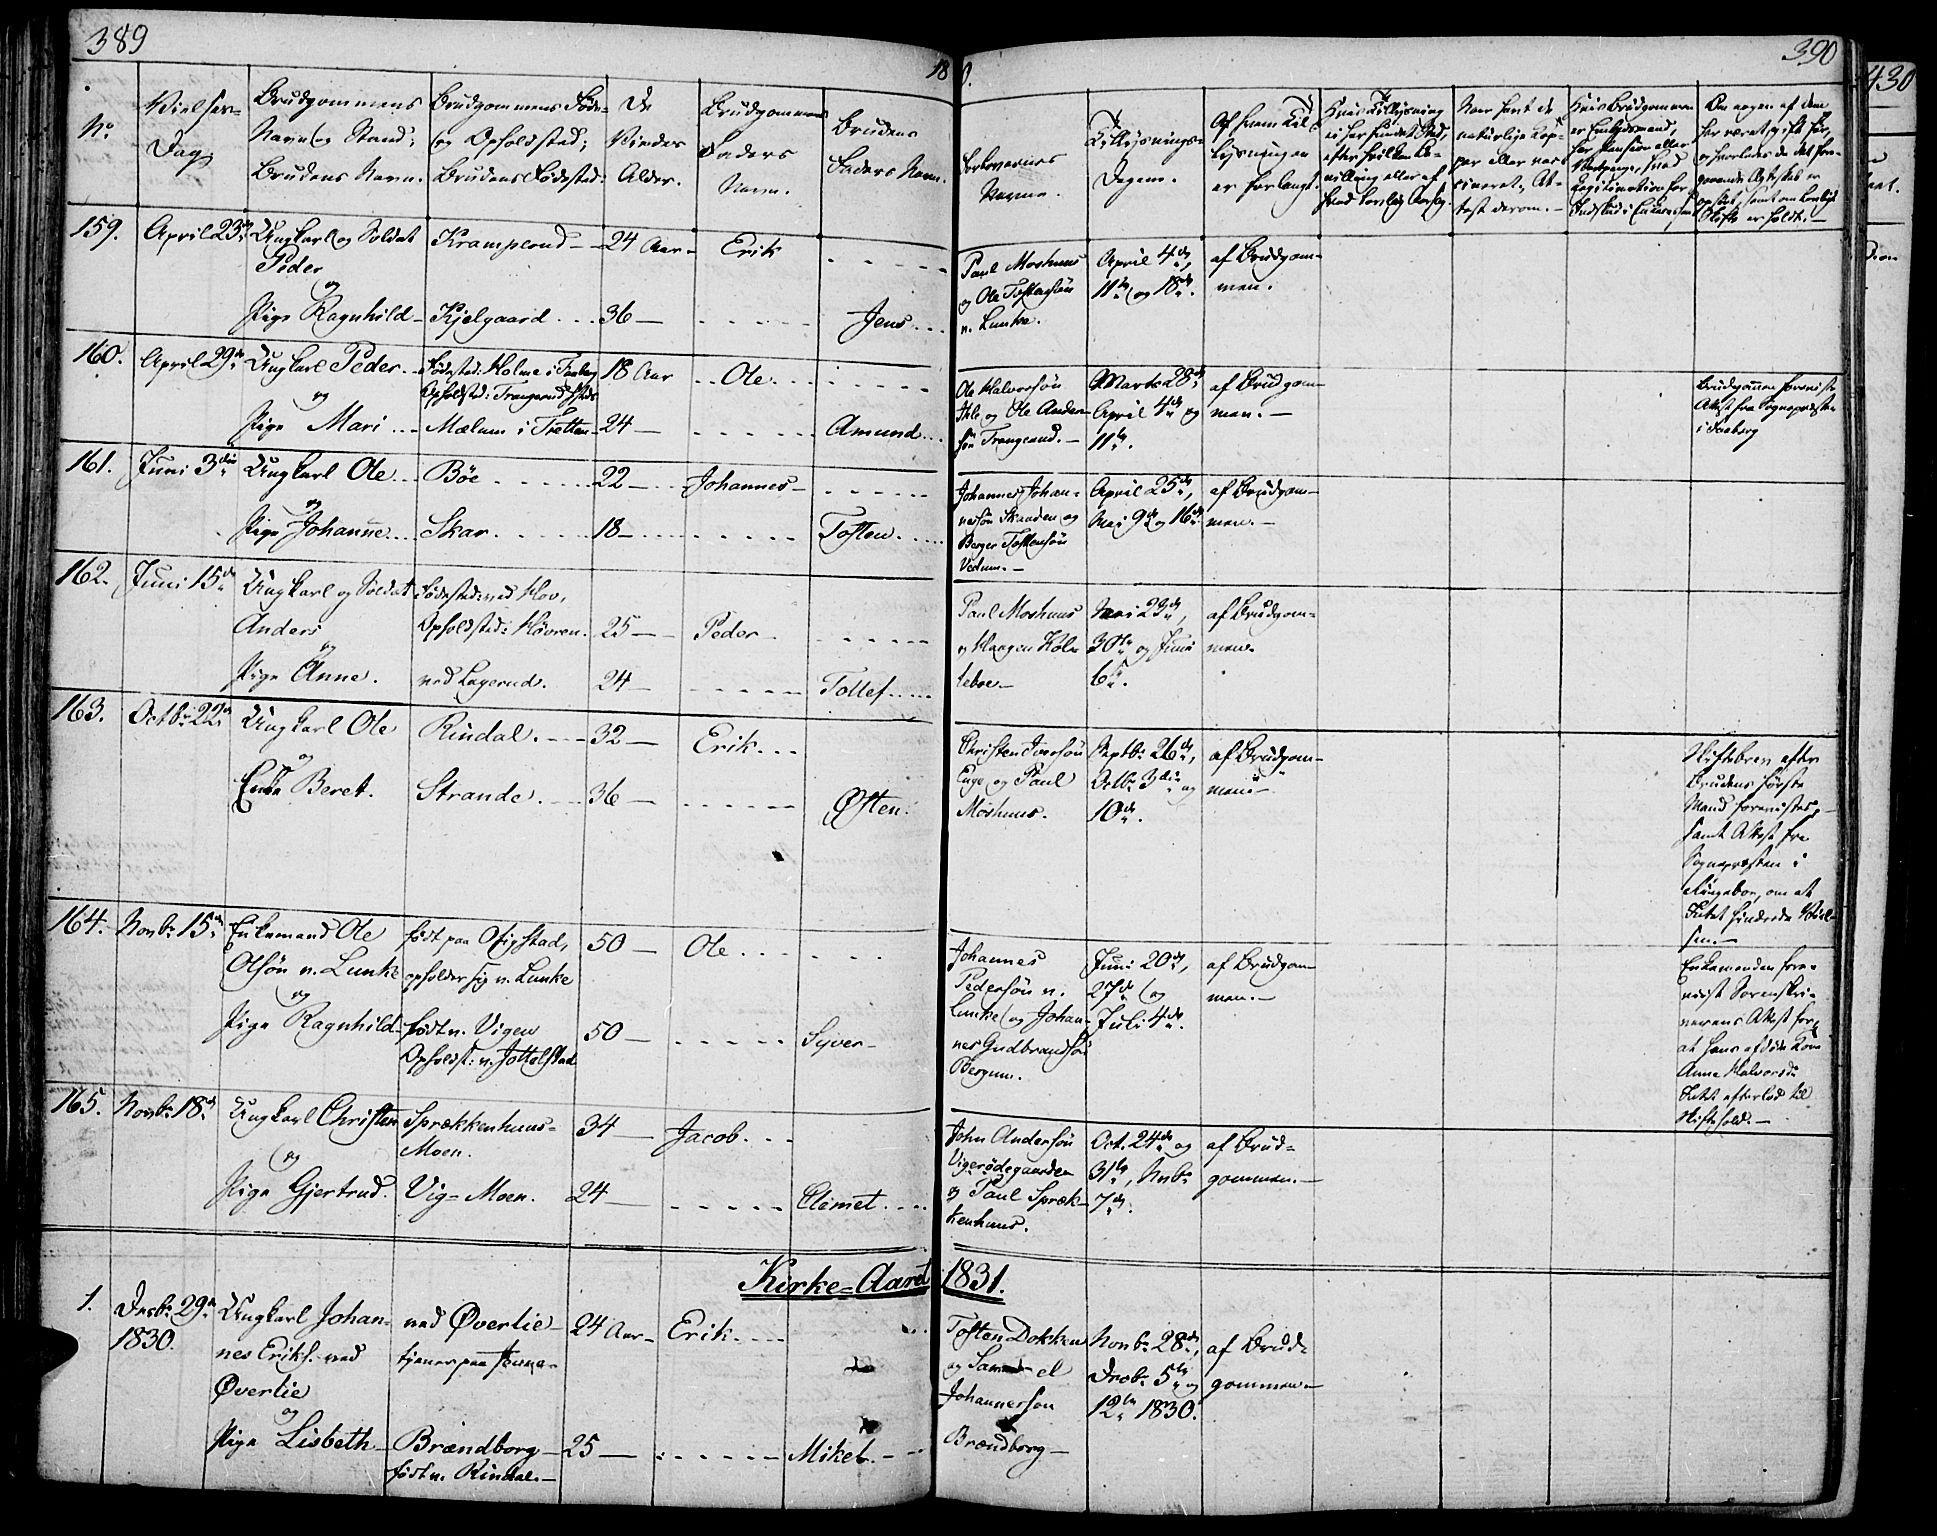 SAH, Øyer prestekontor, Ministerialbok nr. 4, 1824-1841, s. 389-390